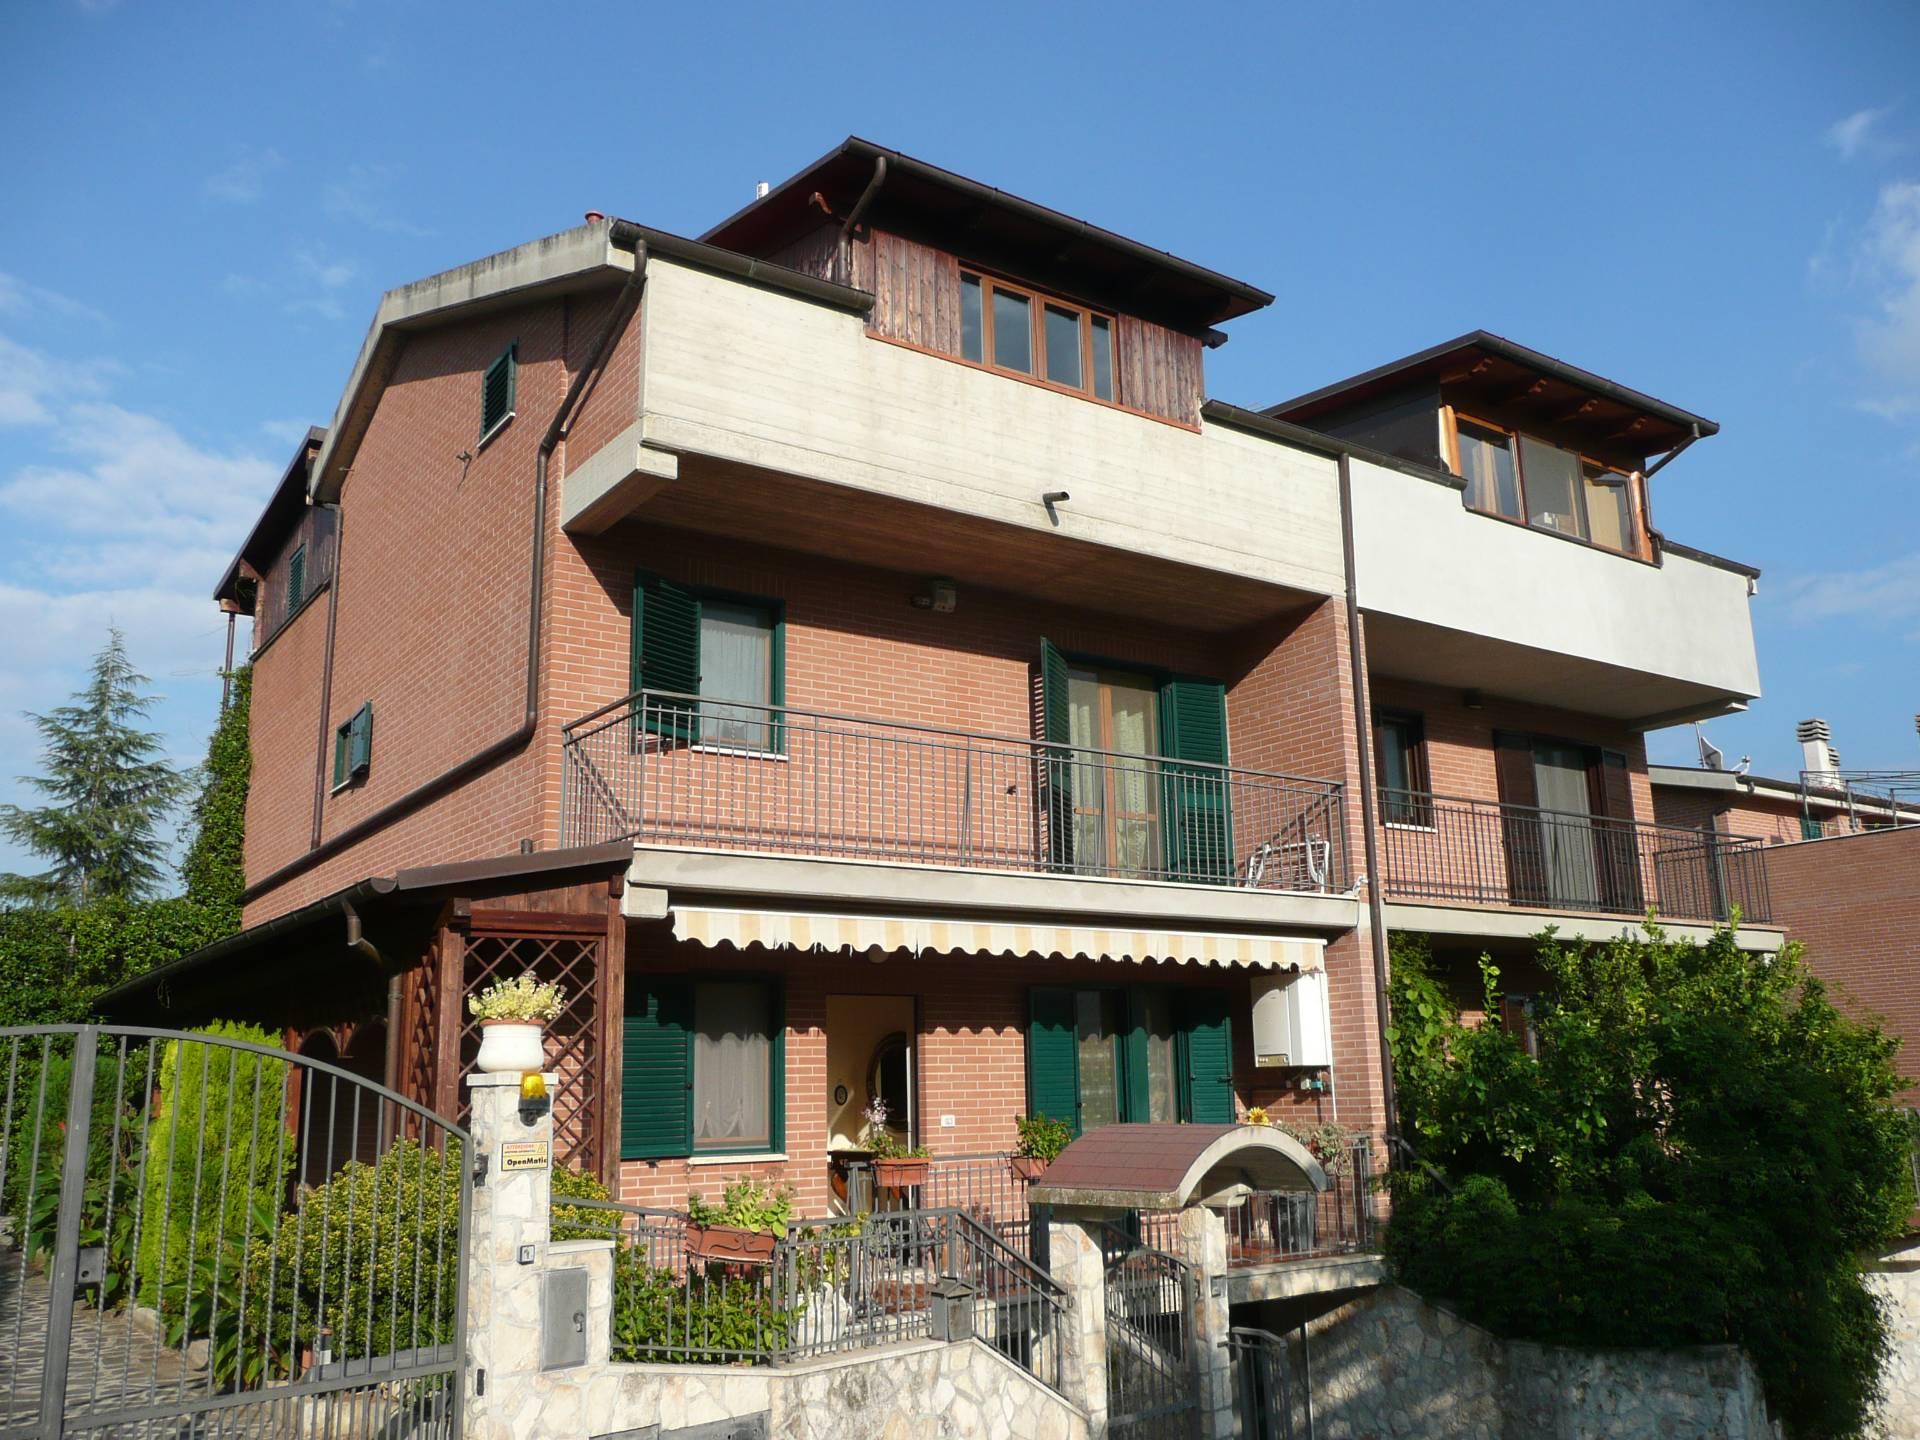 Villa - Casa, 300 Mq, Vendita - Teramo (TE)